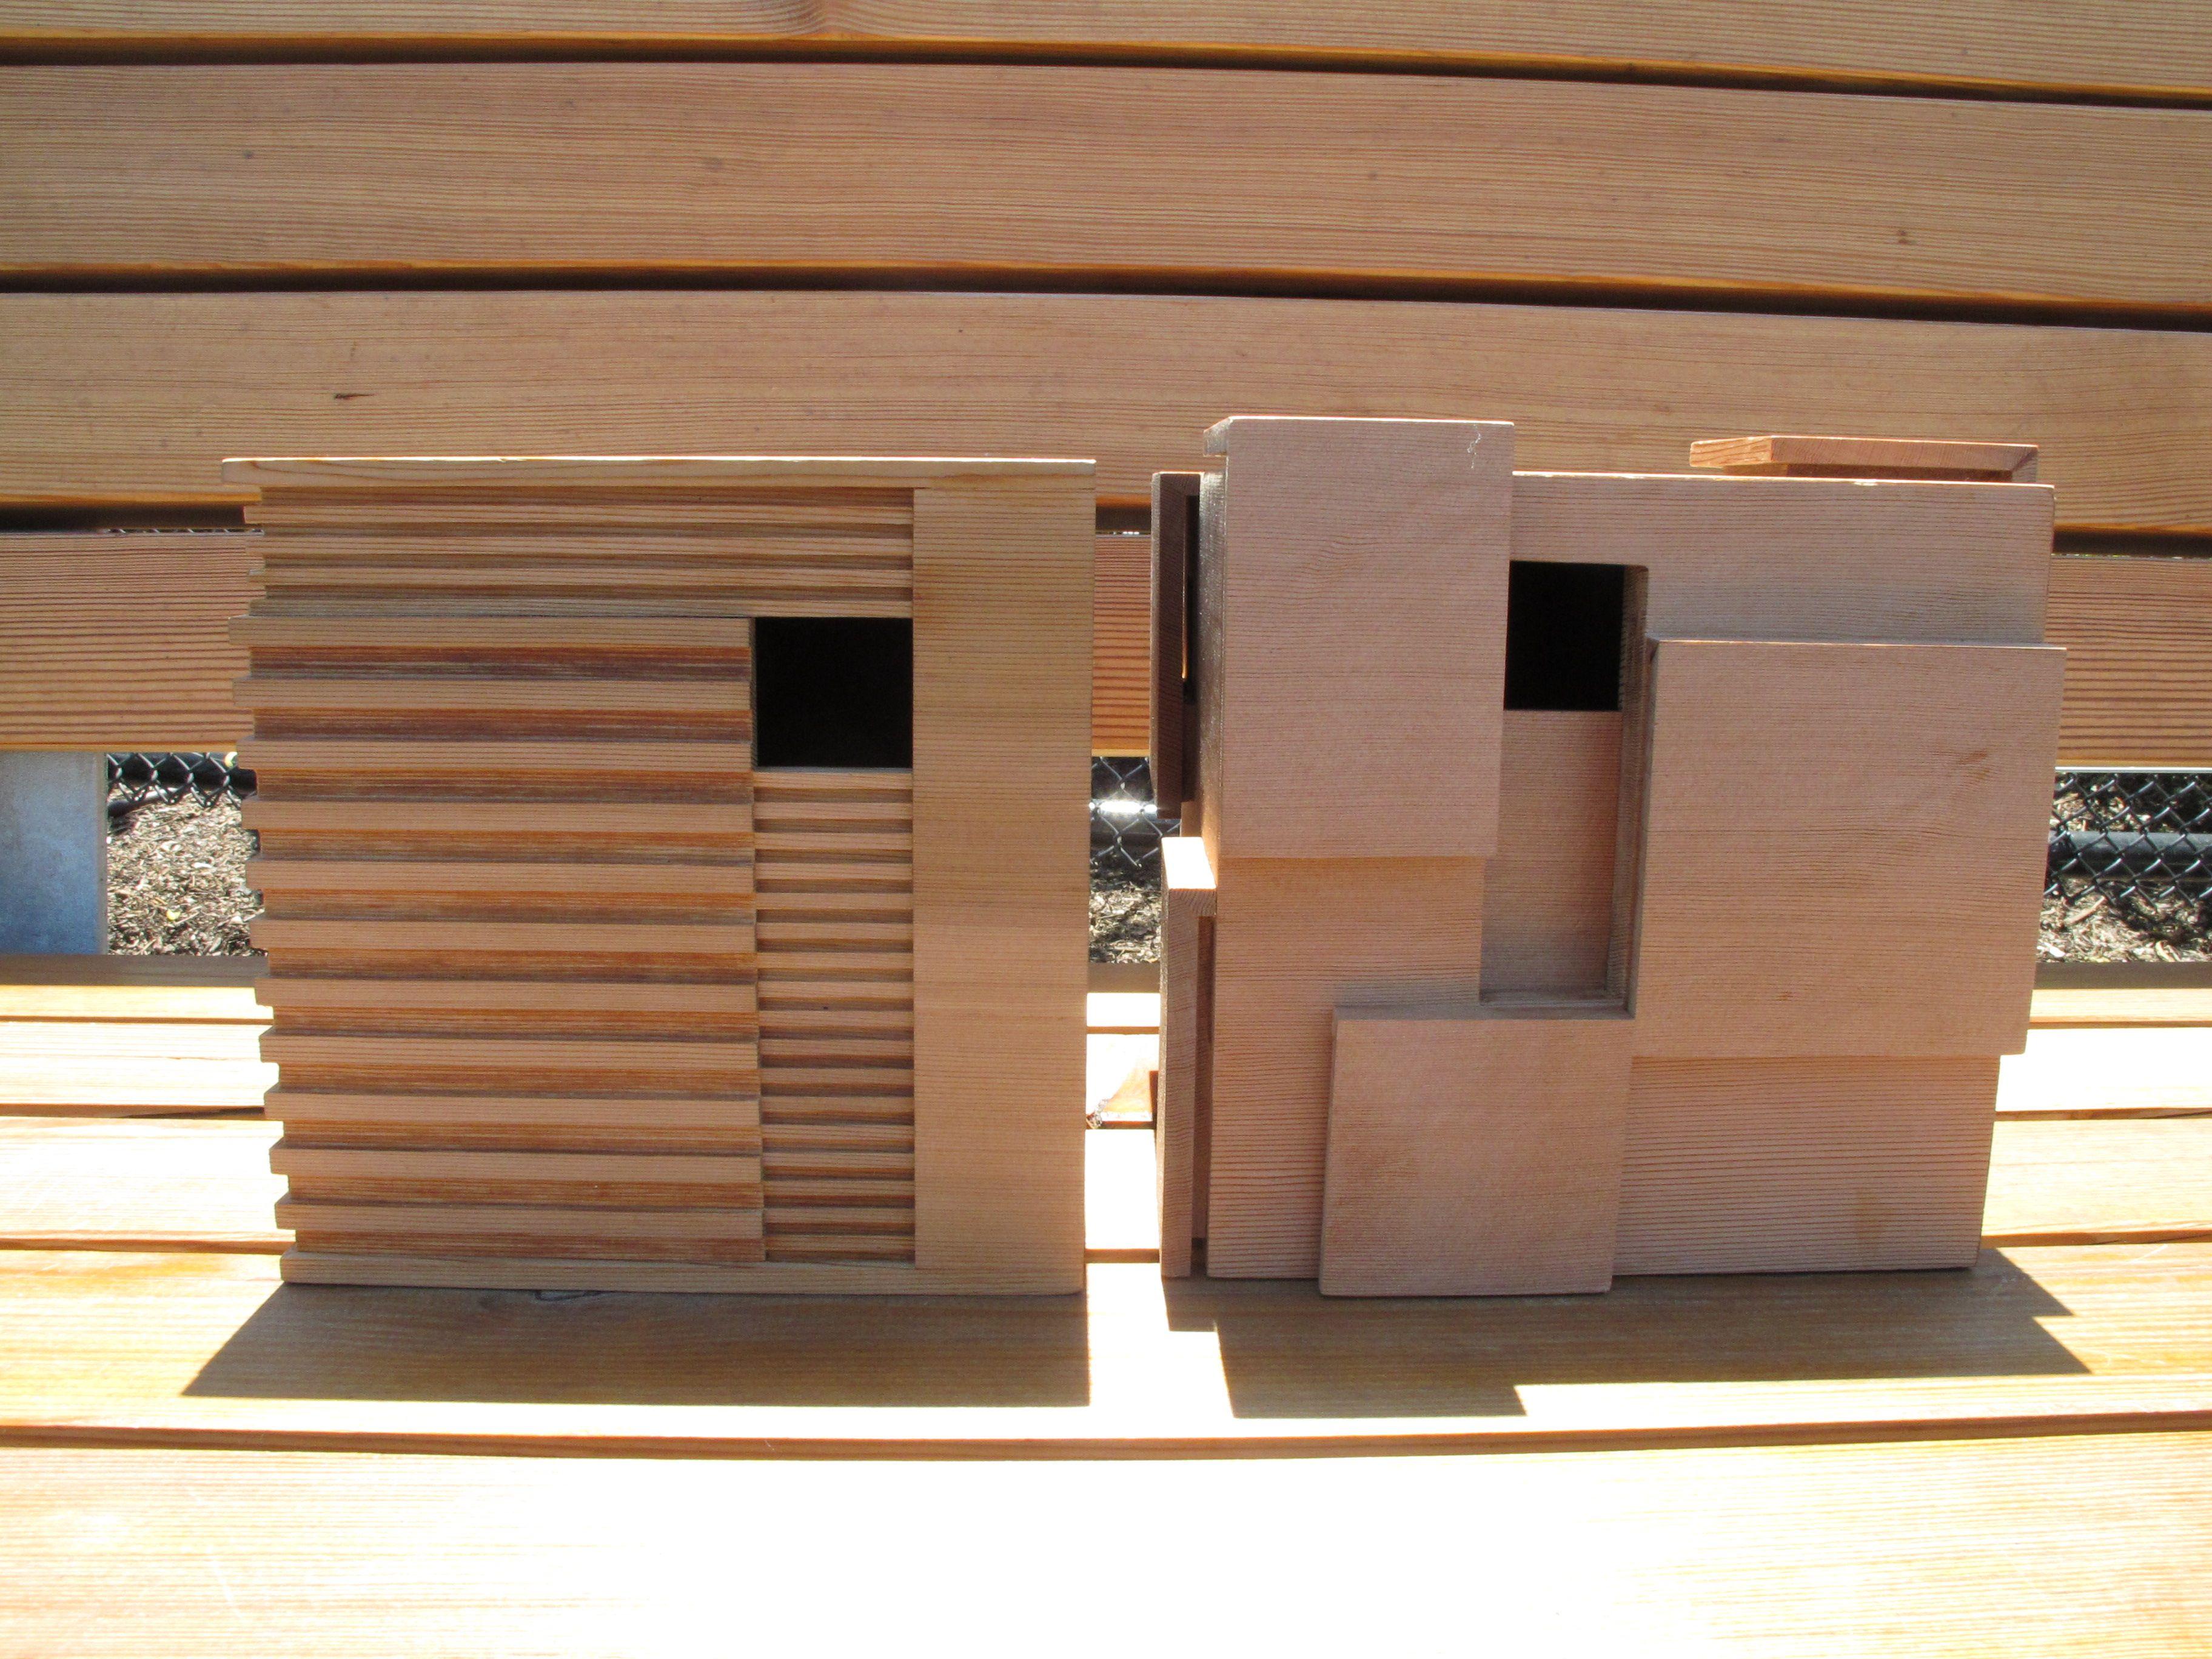 http://architectsandartisans.com/index.php/2012/03/from-bauhaus-to-bird-house/